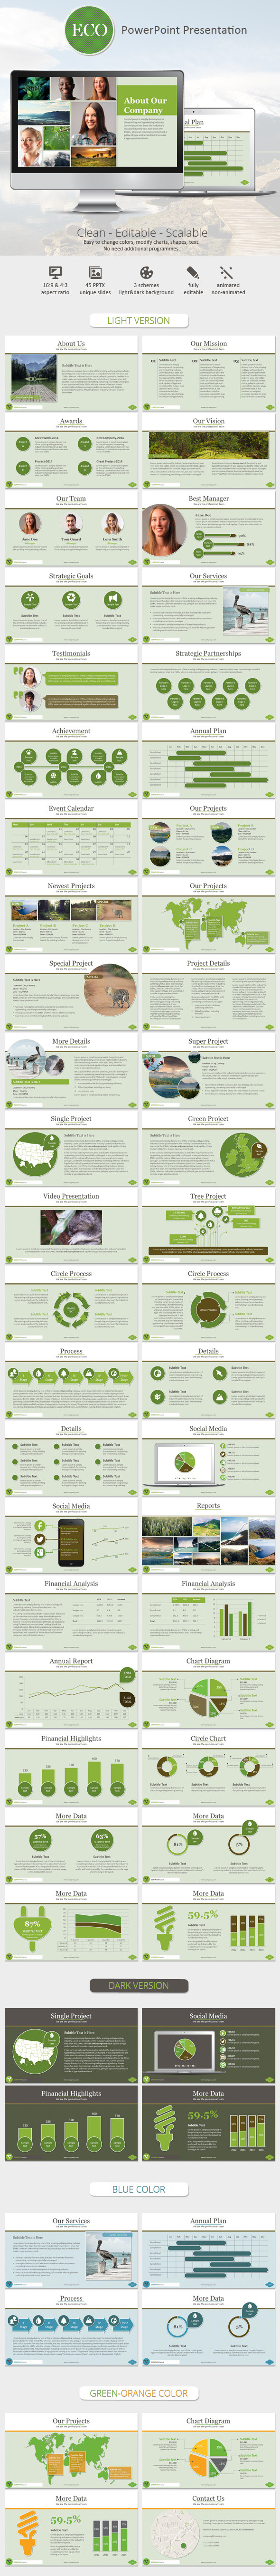 Eco PowerPoint Presentation Template